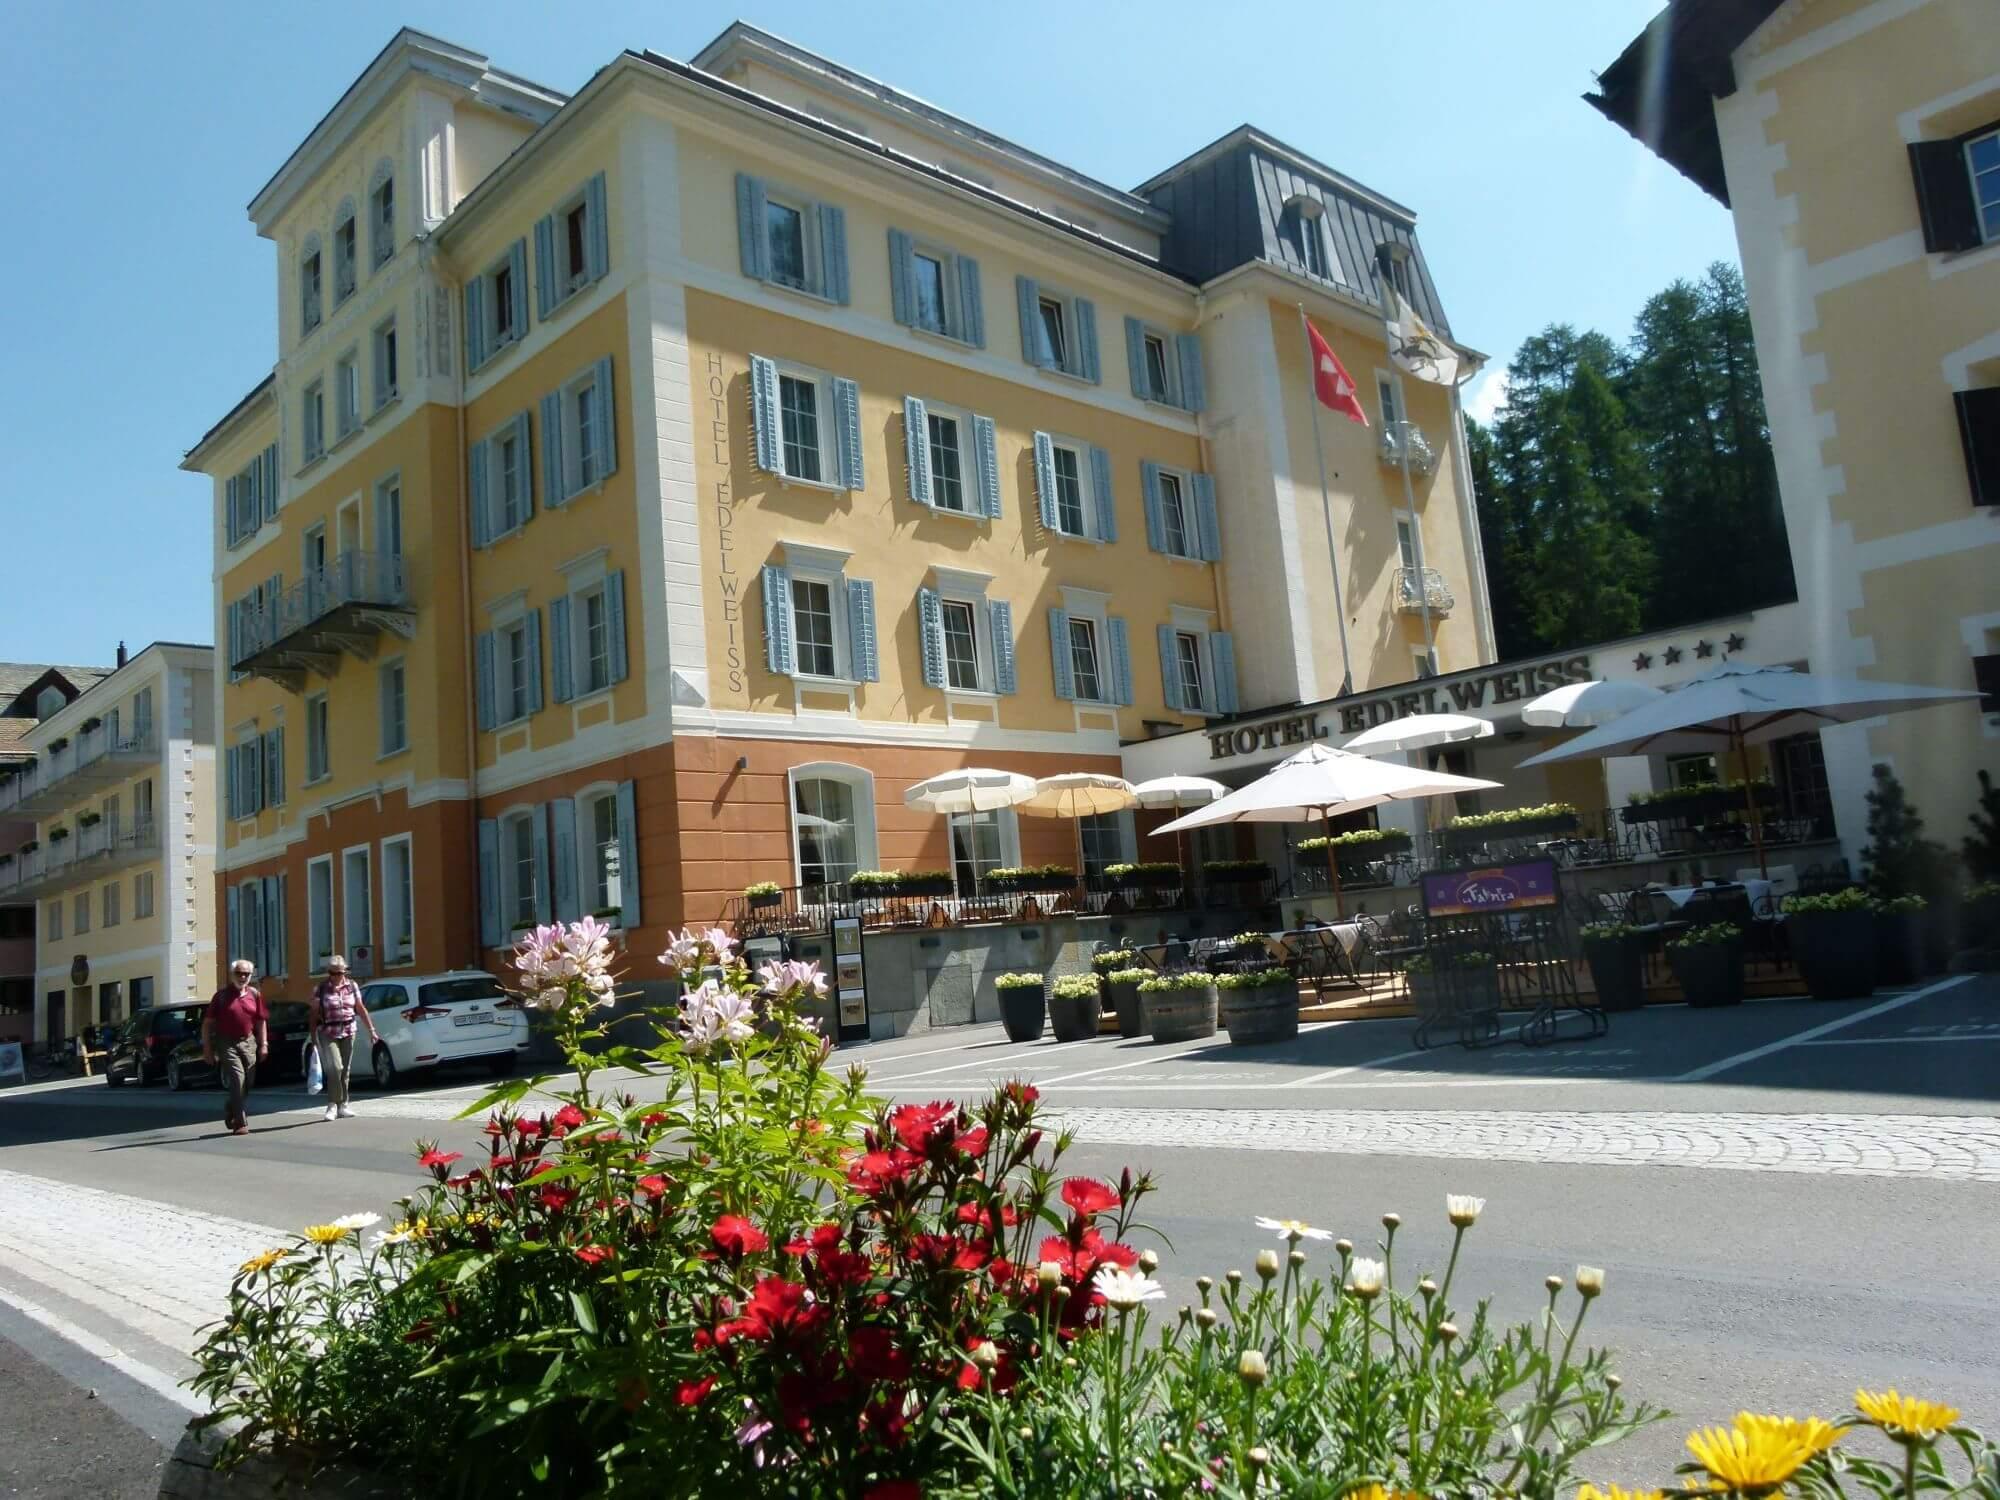 3-tage-im-hotel-edelweiss-in-sils